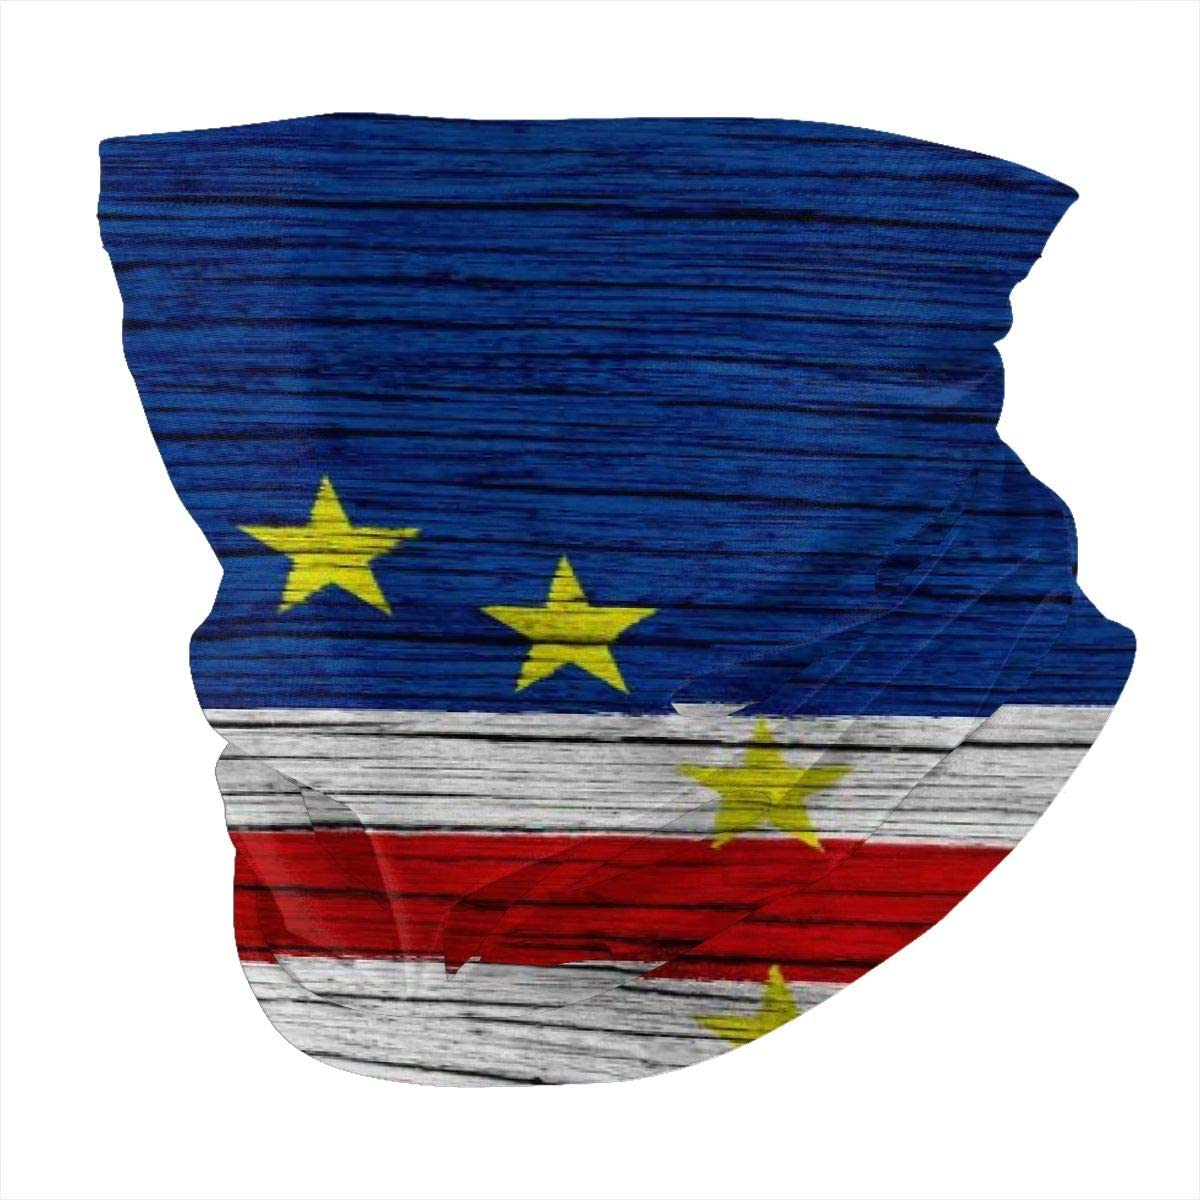 Flag Of Cape Verde Wooden Texture Cape Verdean Headband Headwear Windbreak Scarf Face Mask Washable Dust Mask Balaclava Neck Bandana